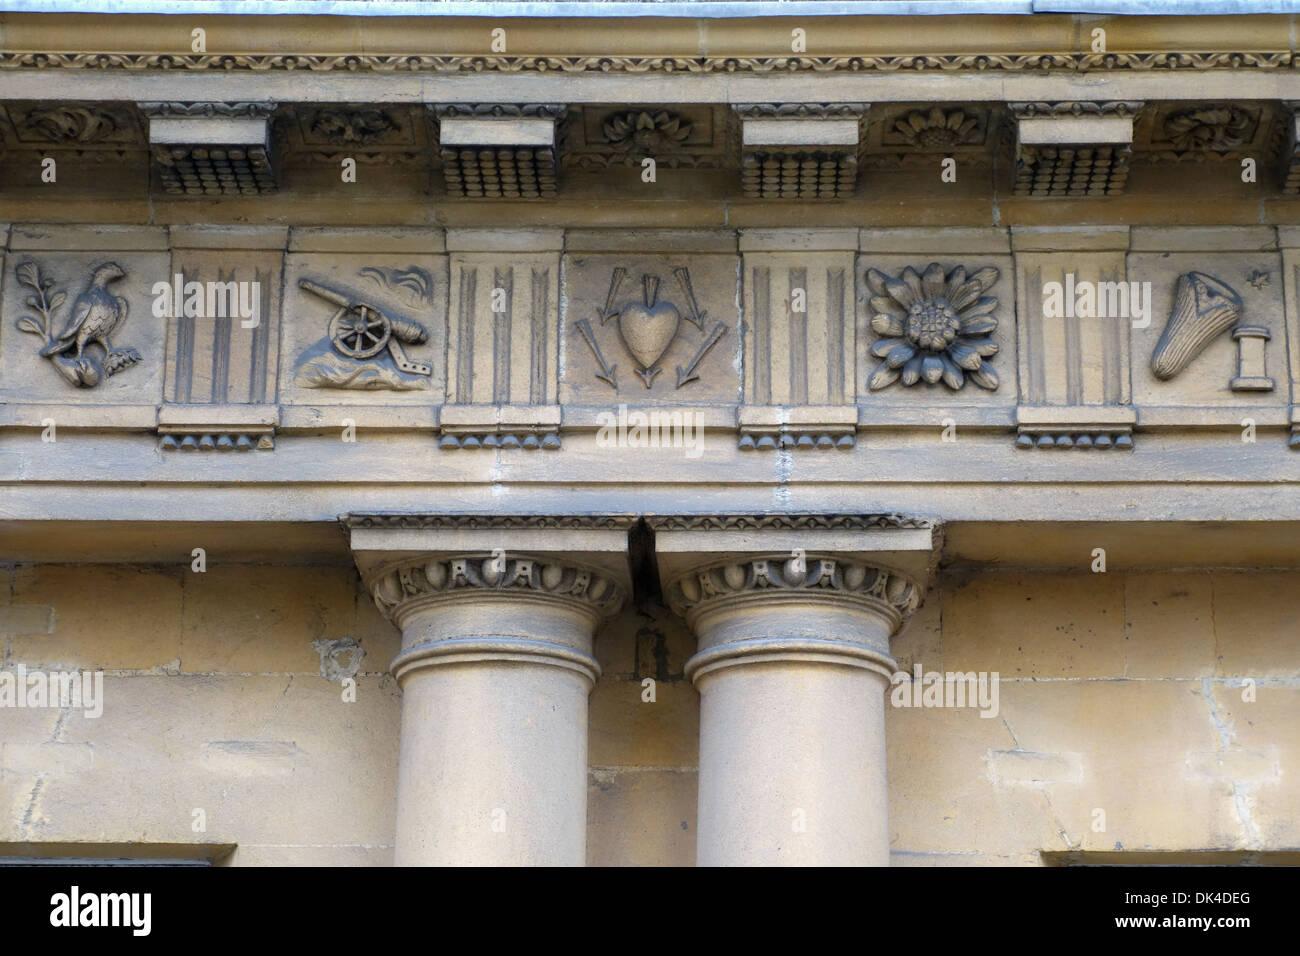 Stone Frieze, The Circus, Bath, England - Stock Image